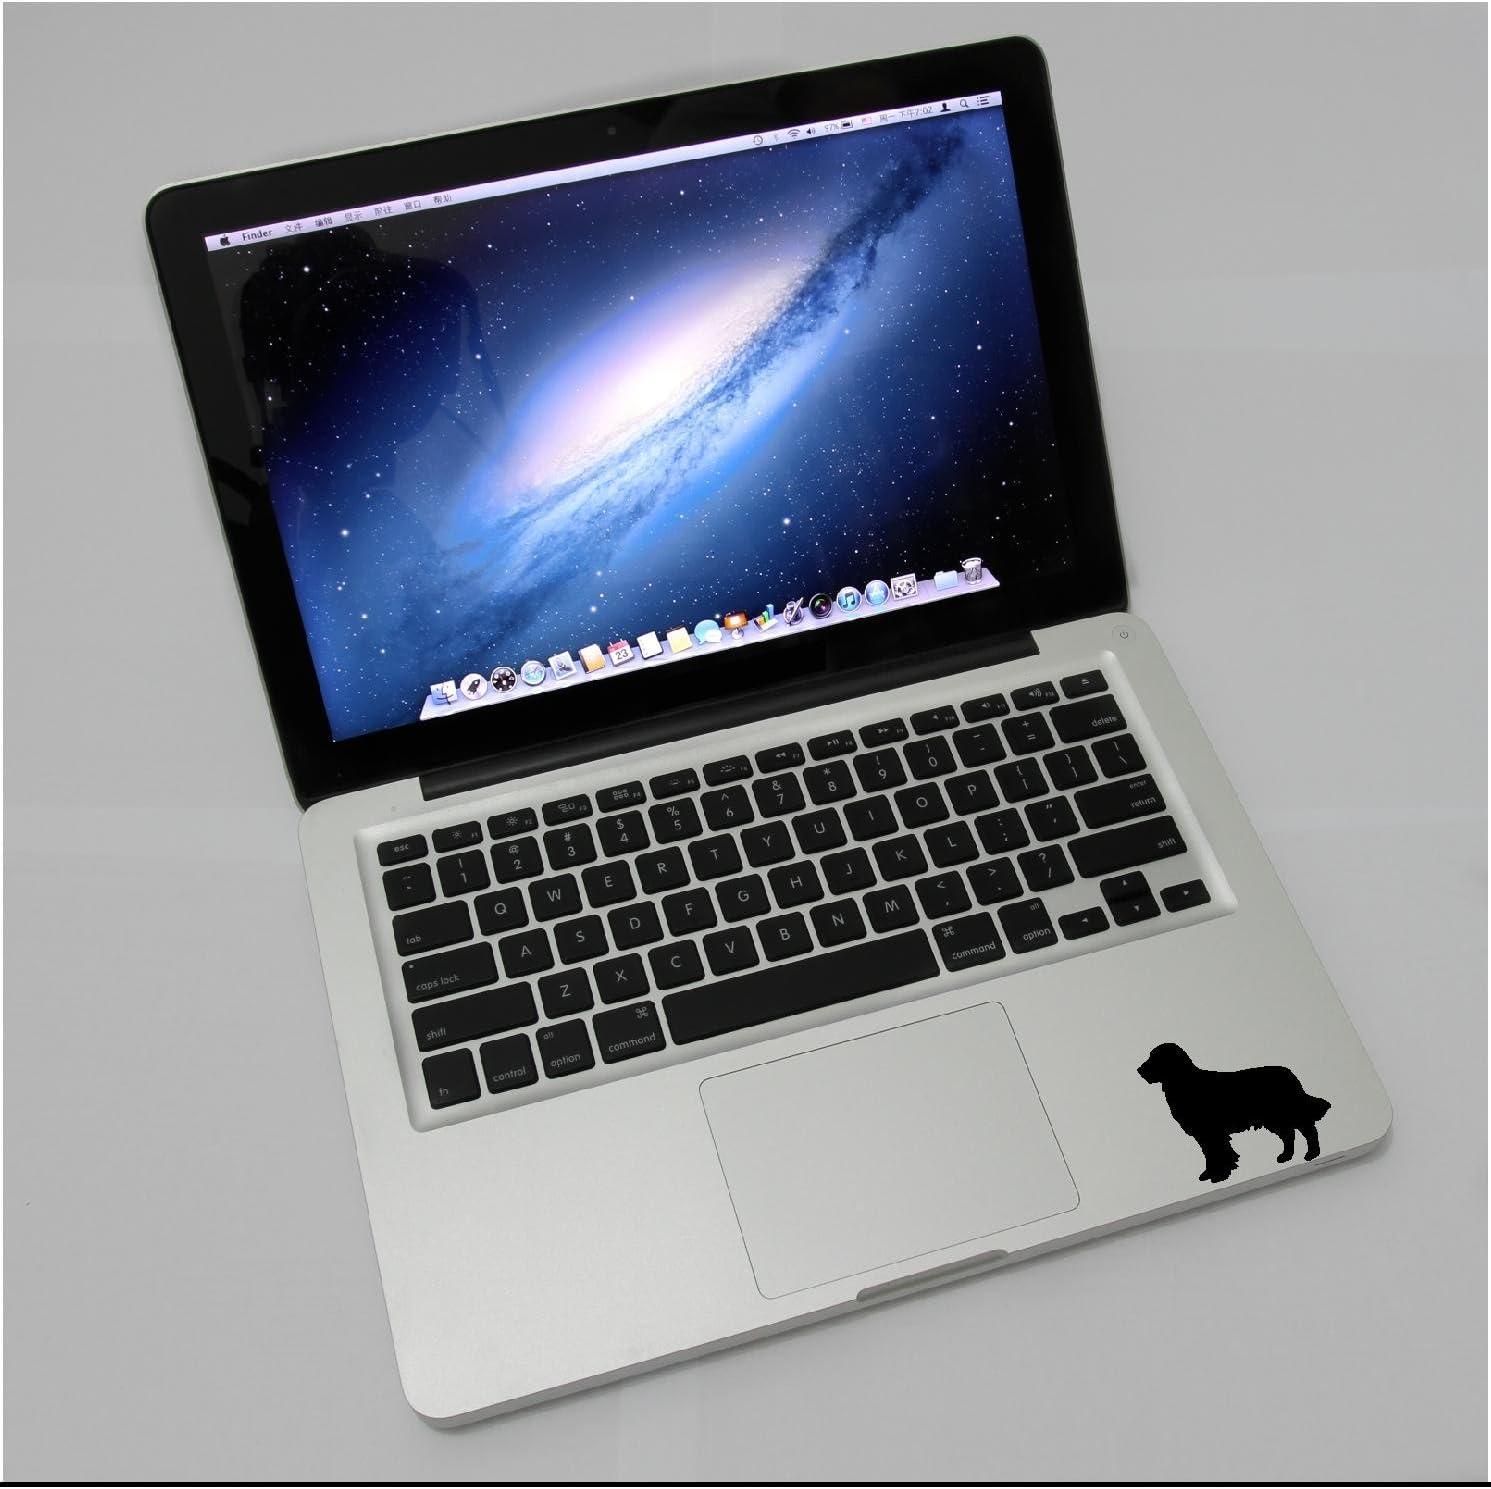 Laptop - Golden Retriever Dog pet Cute Decal - Matte Black Skins Stickers